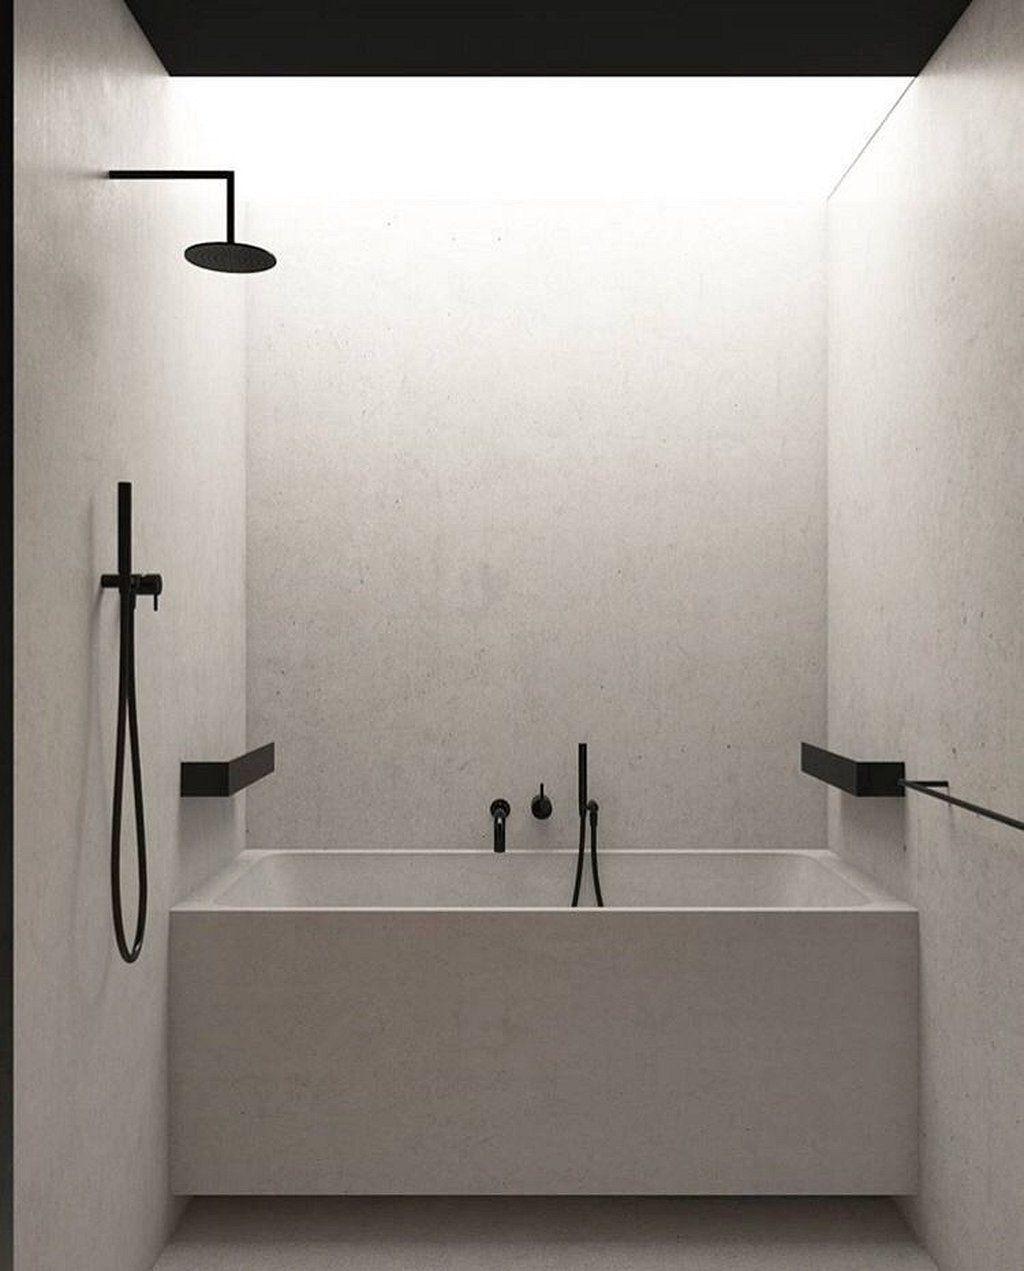 105 Inspiring Examples Of Contemporary Interior Design Https Www Mobmasker C Bathroom Interior Design Minimalist Bathroom Design Contemporary Interior Design